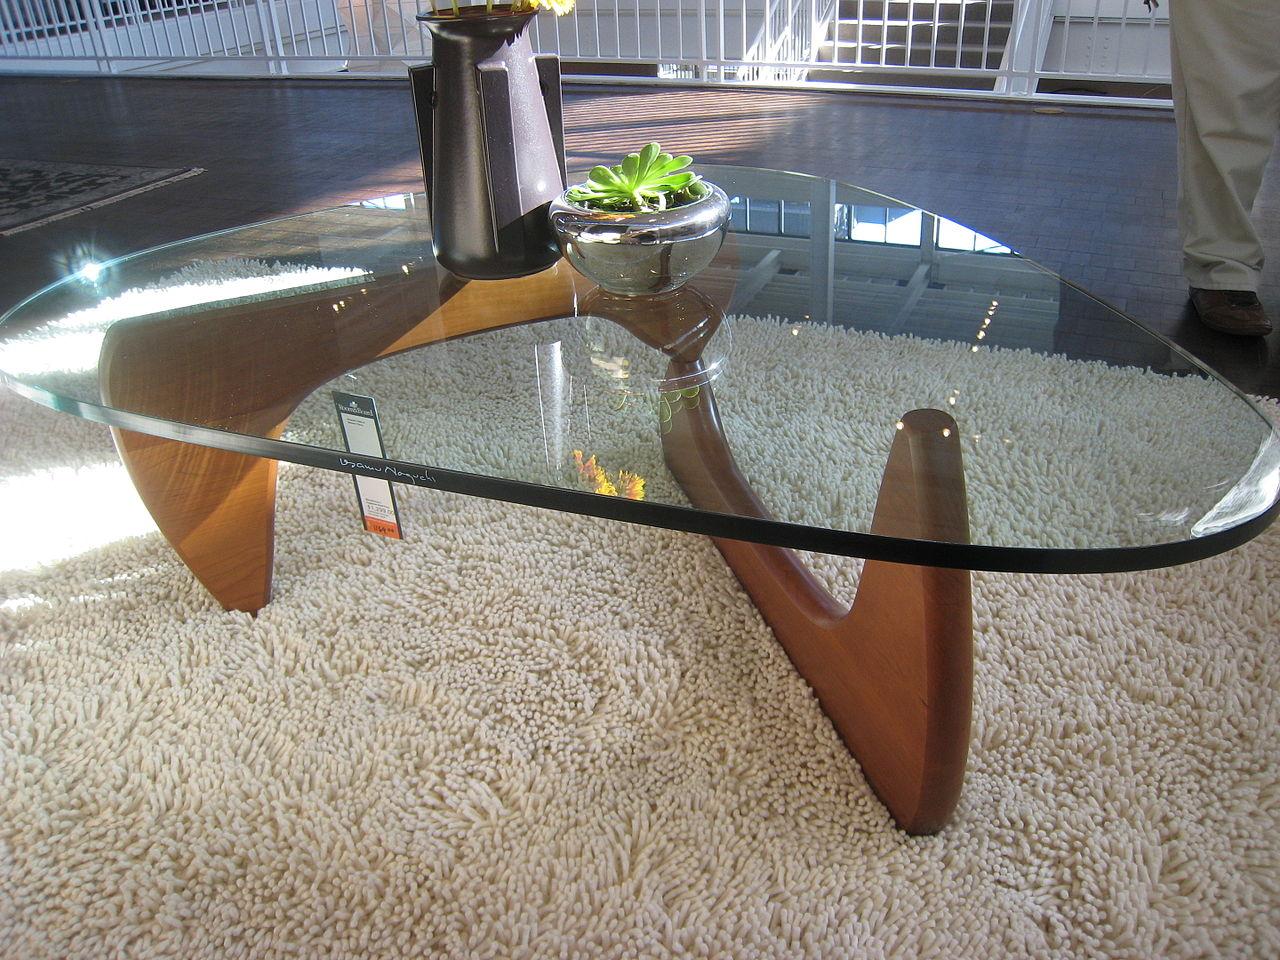 file noguchi coffee table 2599969608 jpg wikimedia commons. Black Bedroom Furniture Sets. Home Design Ideas